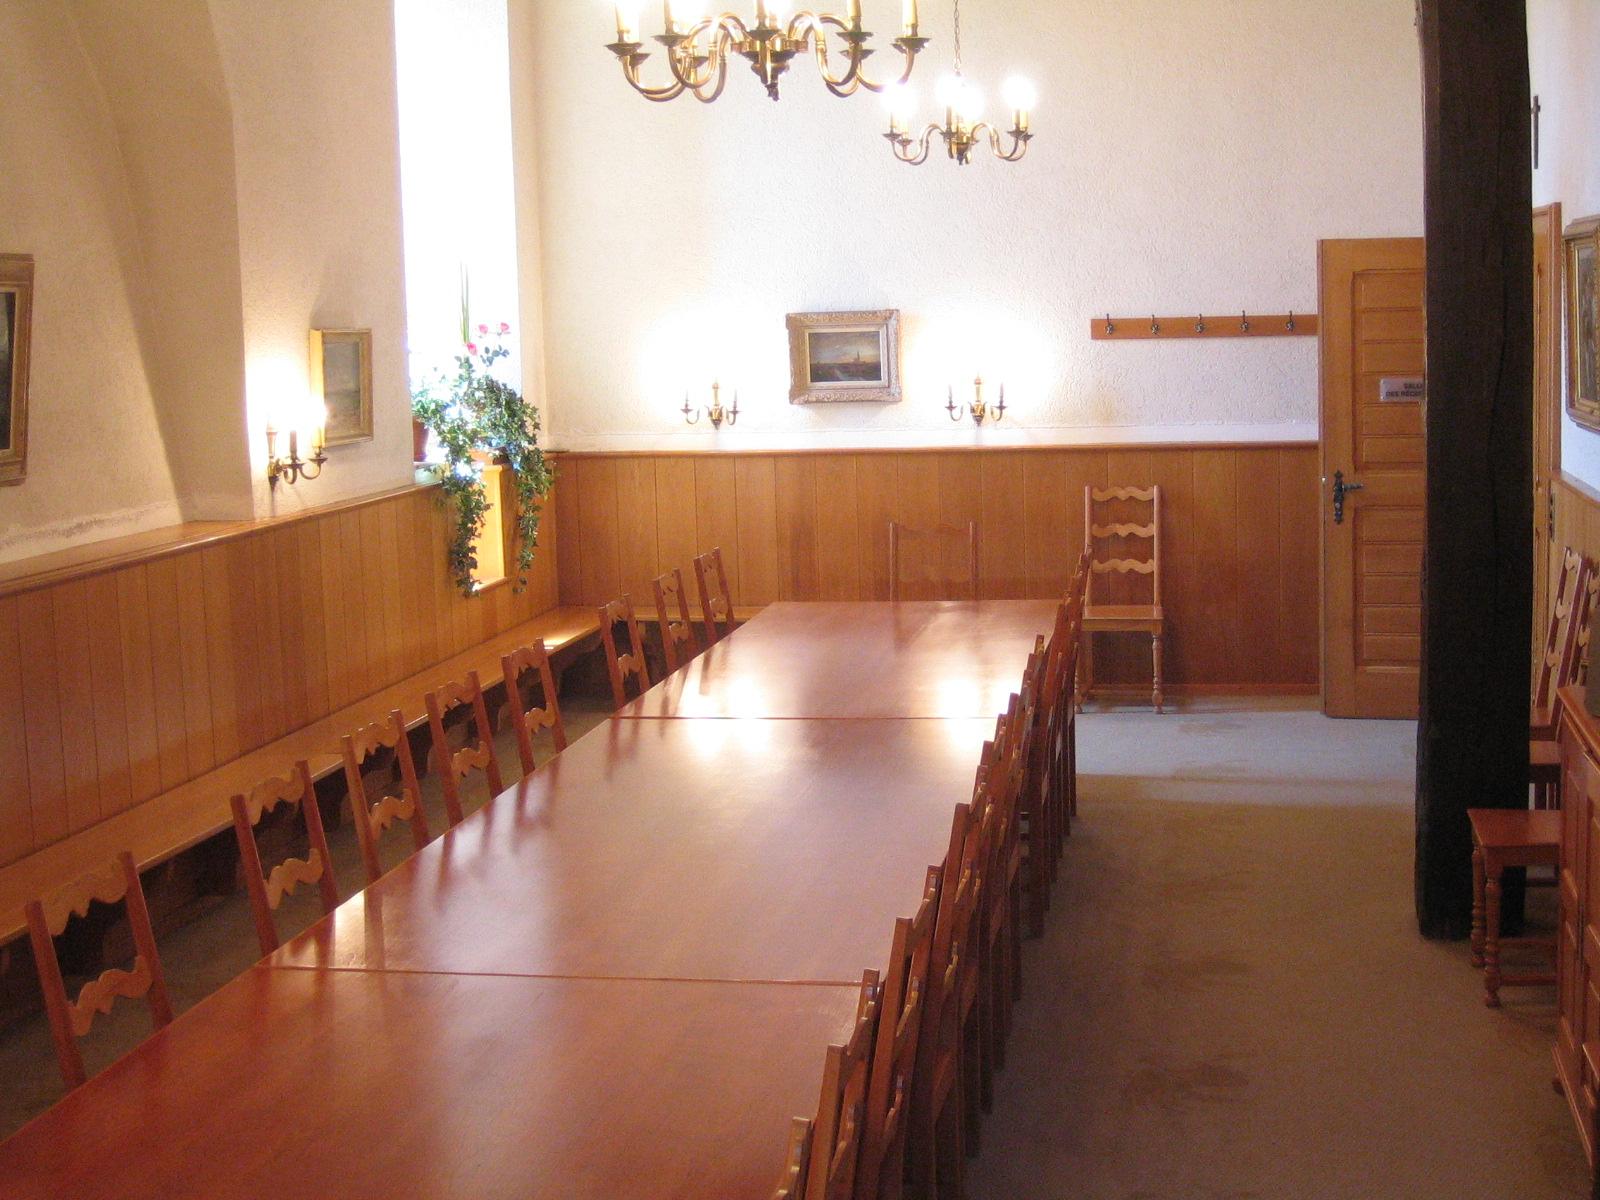 Salle des réceptions du château de Bulle- Empfangsraum Schloss Bulle